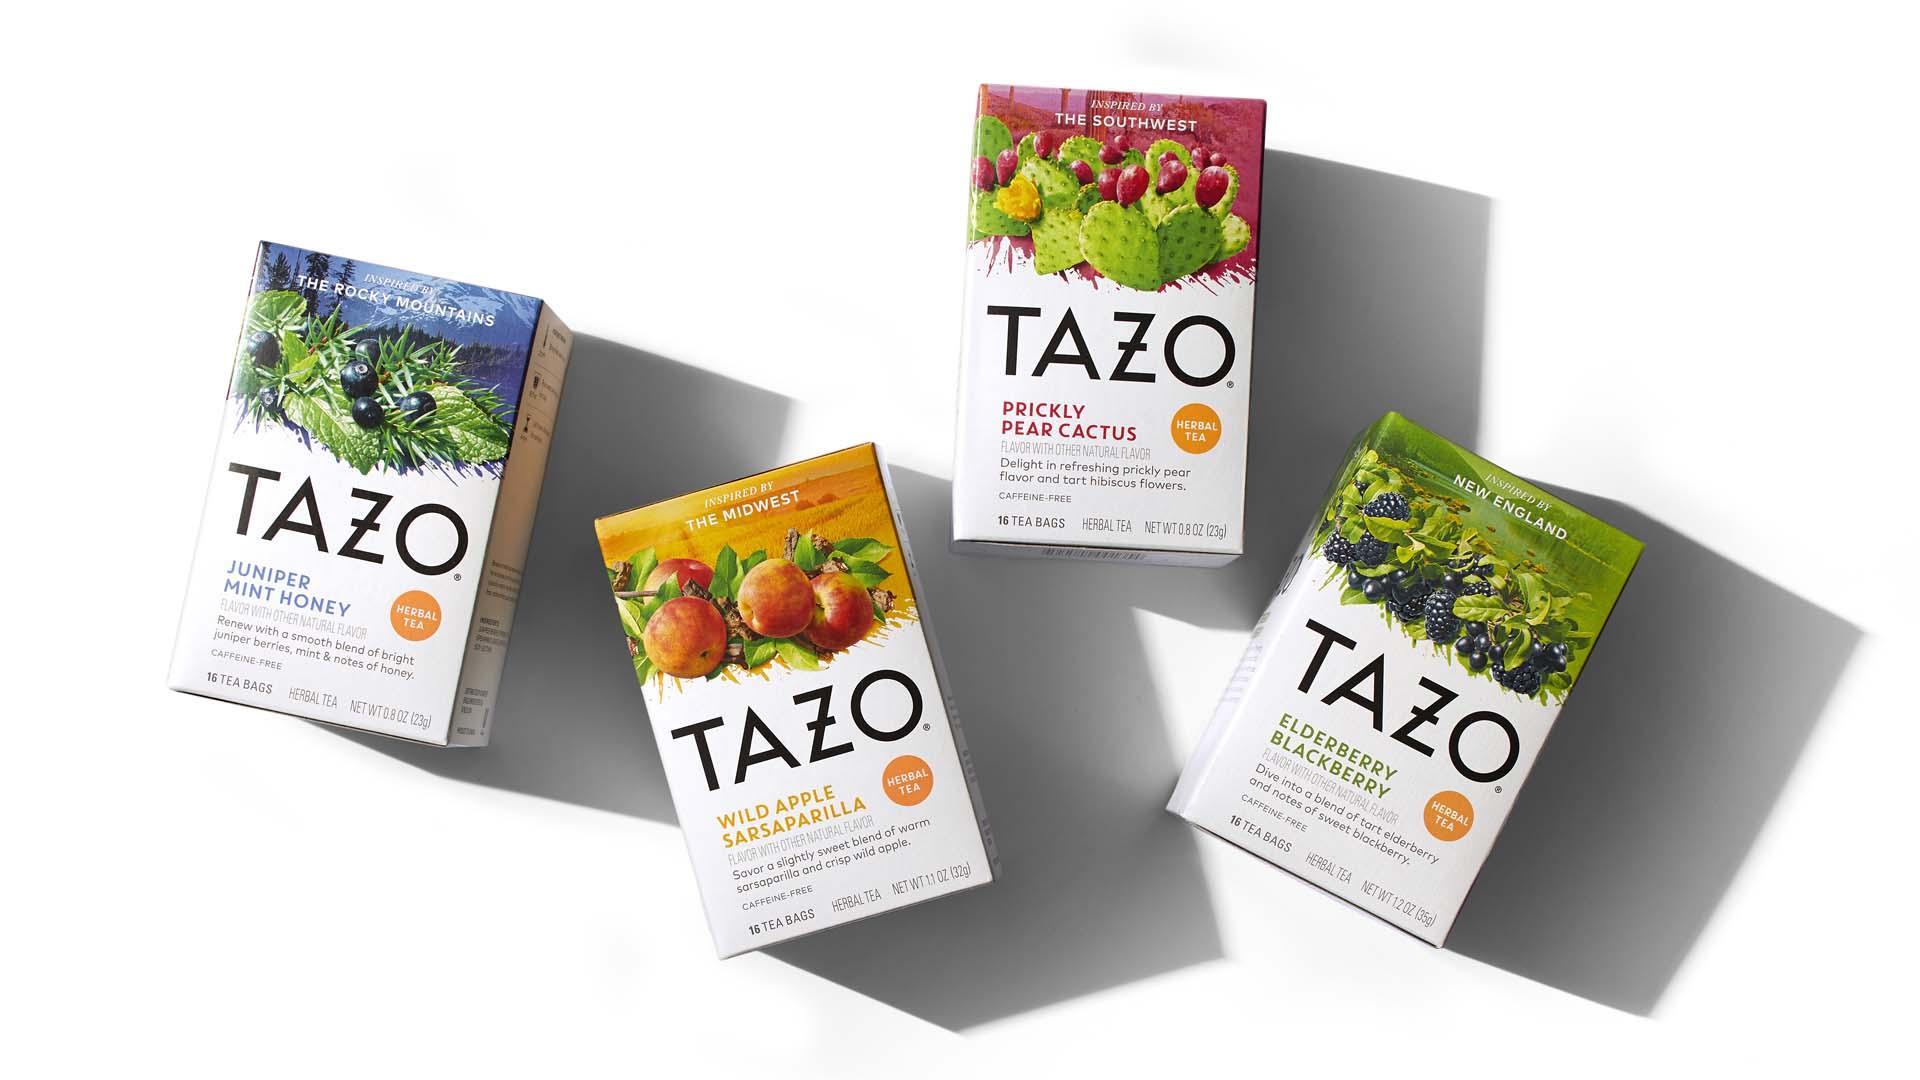 DDW TAZO Flavor Burst